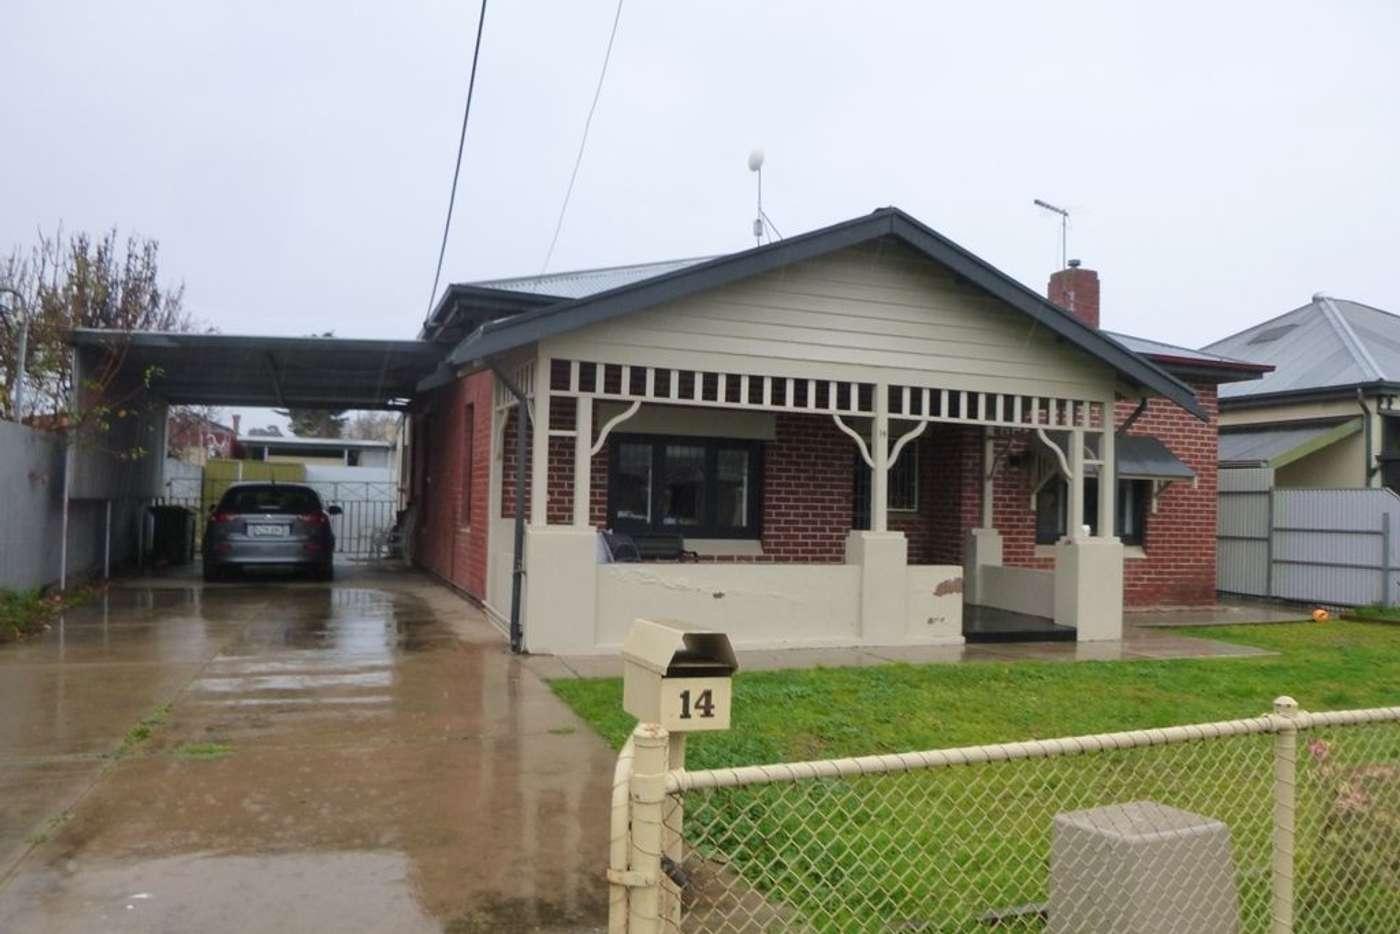 Main view of Homely house listing, 14 Seventh Avenue, Cheltenham SA 5014